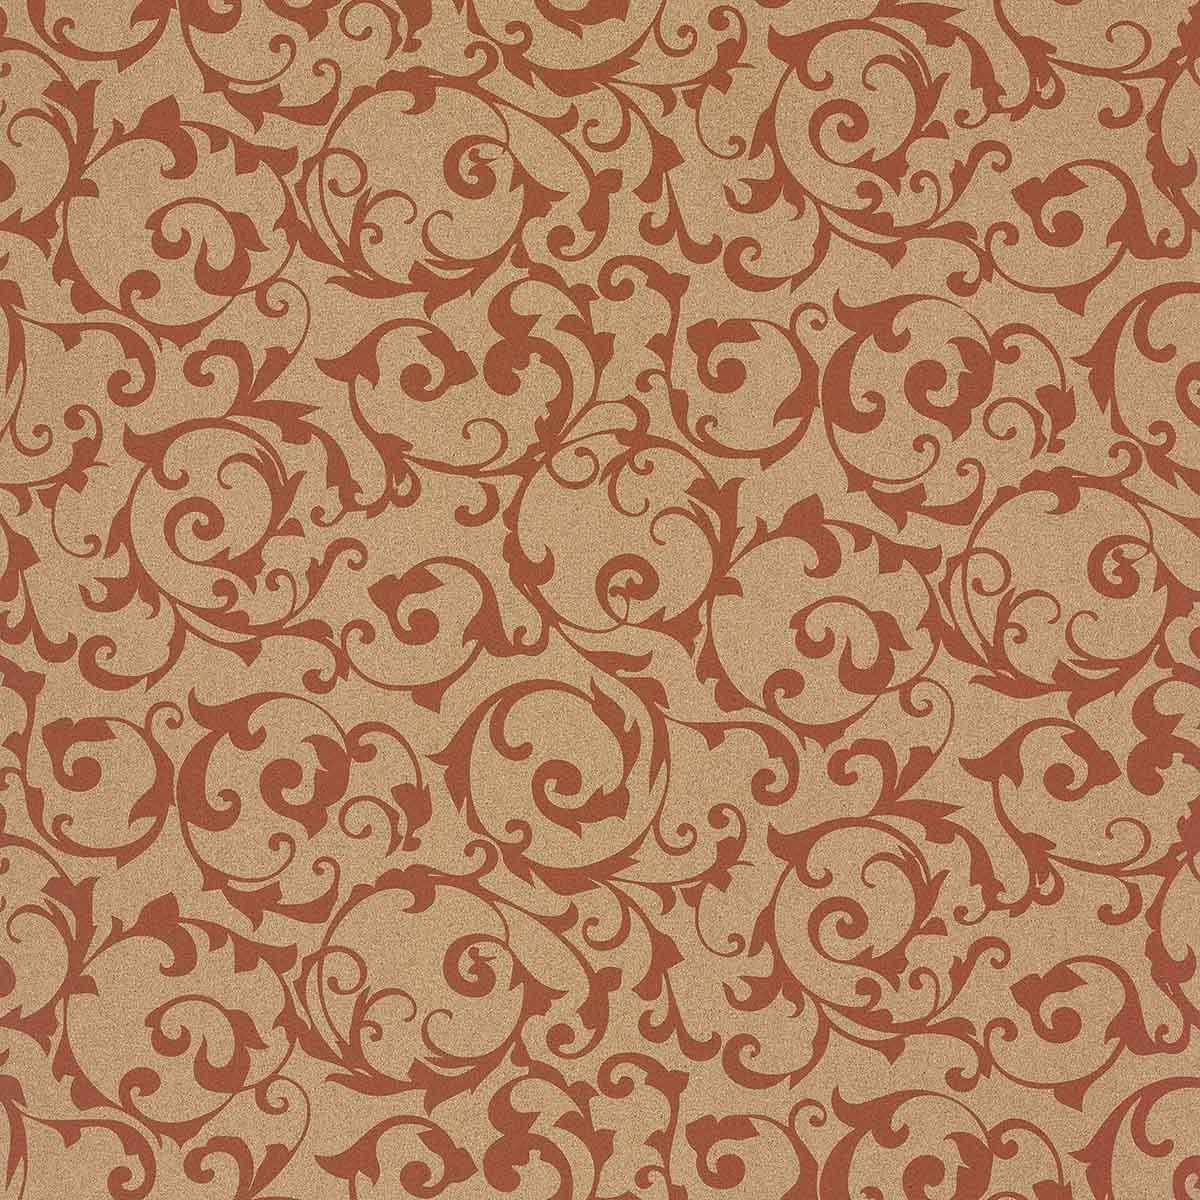 Decorative cork thin paper Sophistication 05.03